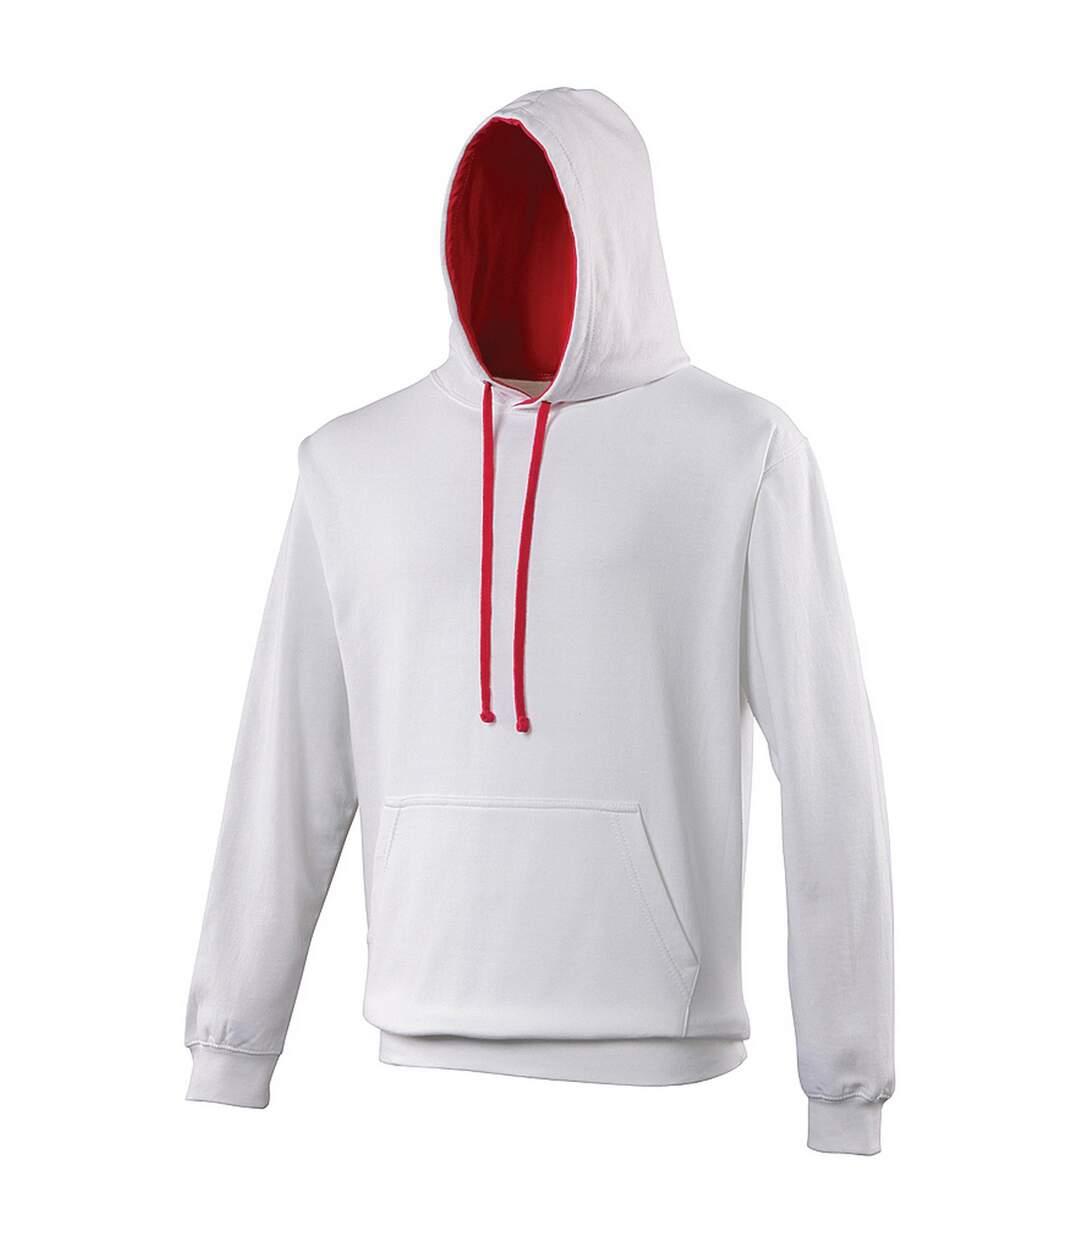 Awdis Varsity Hooded Sweatshirt / Hoodie (Sapphire Blue / Heather Grey) - UTRW165